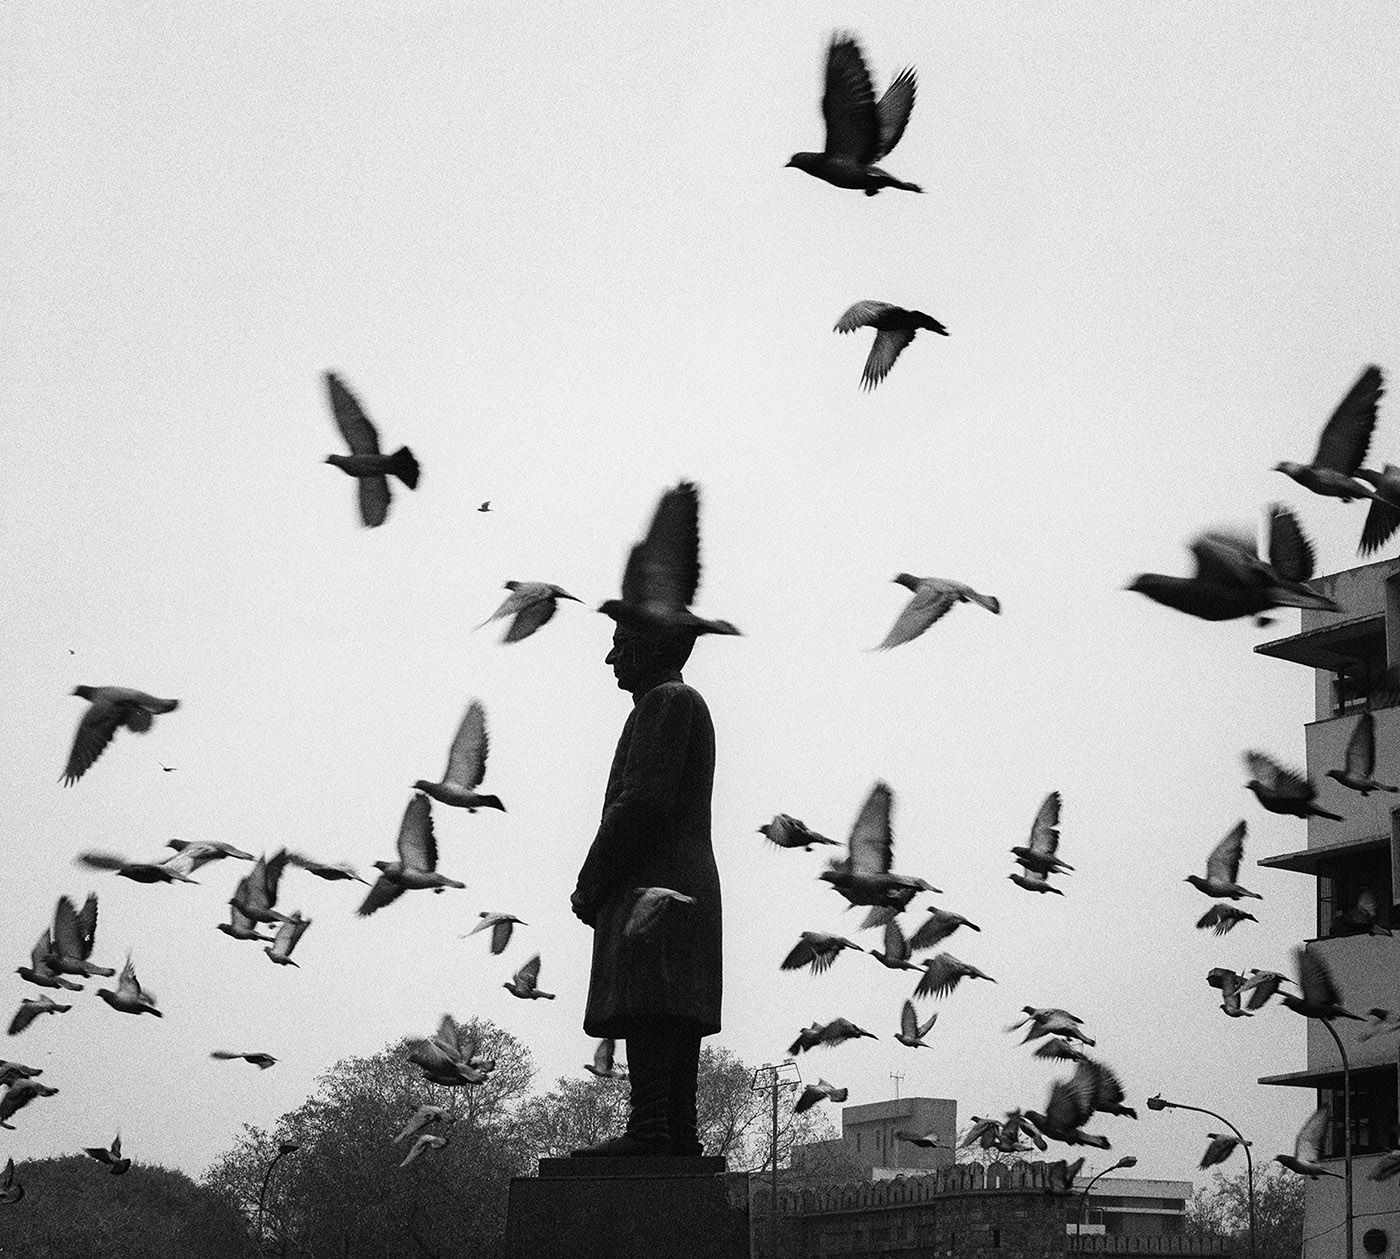 Pentti Sammallahti (b. 1950, Helsinki), Delhi, India, 1999